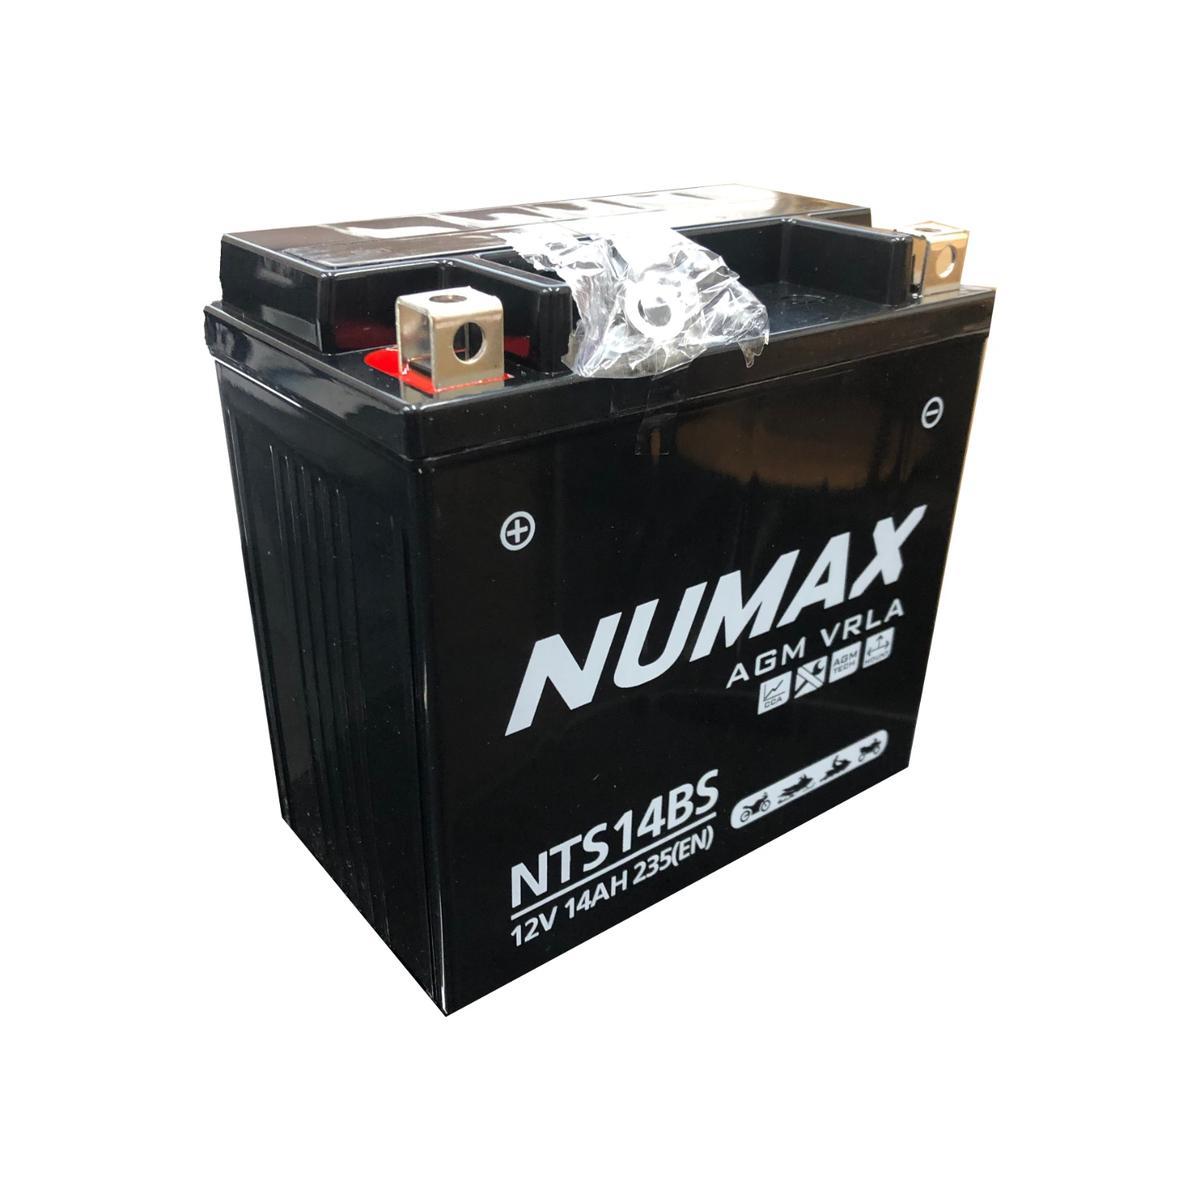 Numax NTS14BS Aprilia RSV Mille 1000 Motorbike Battery